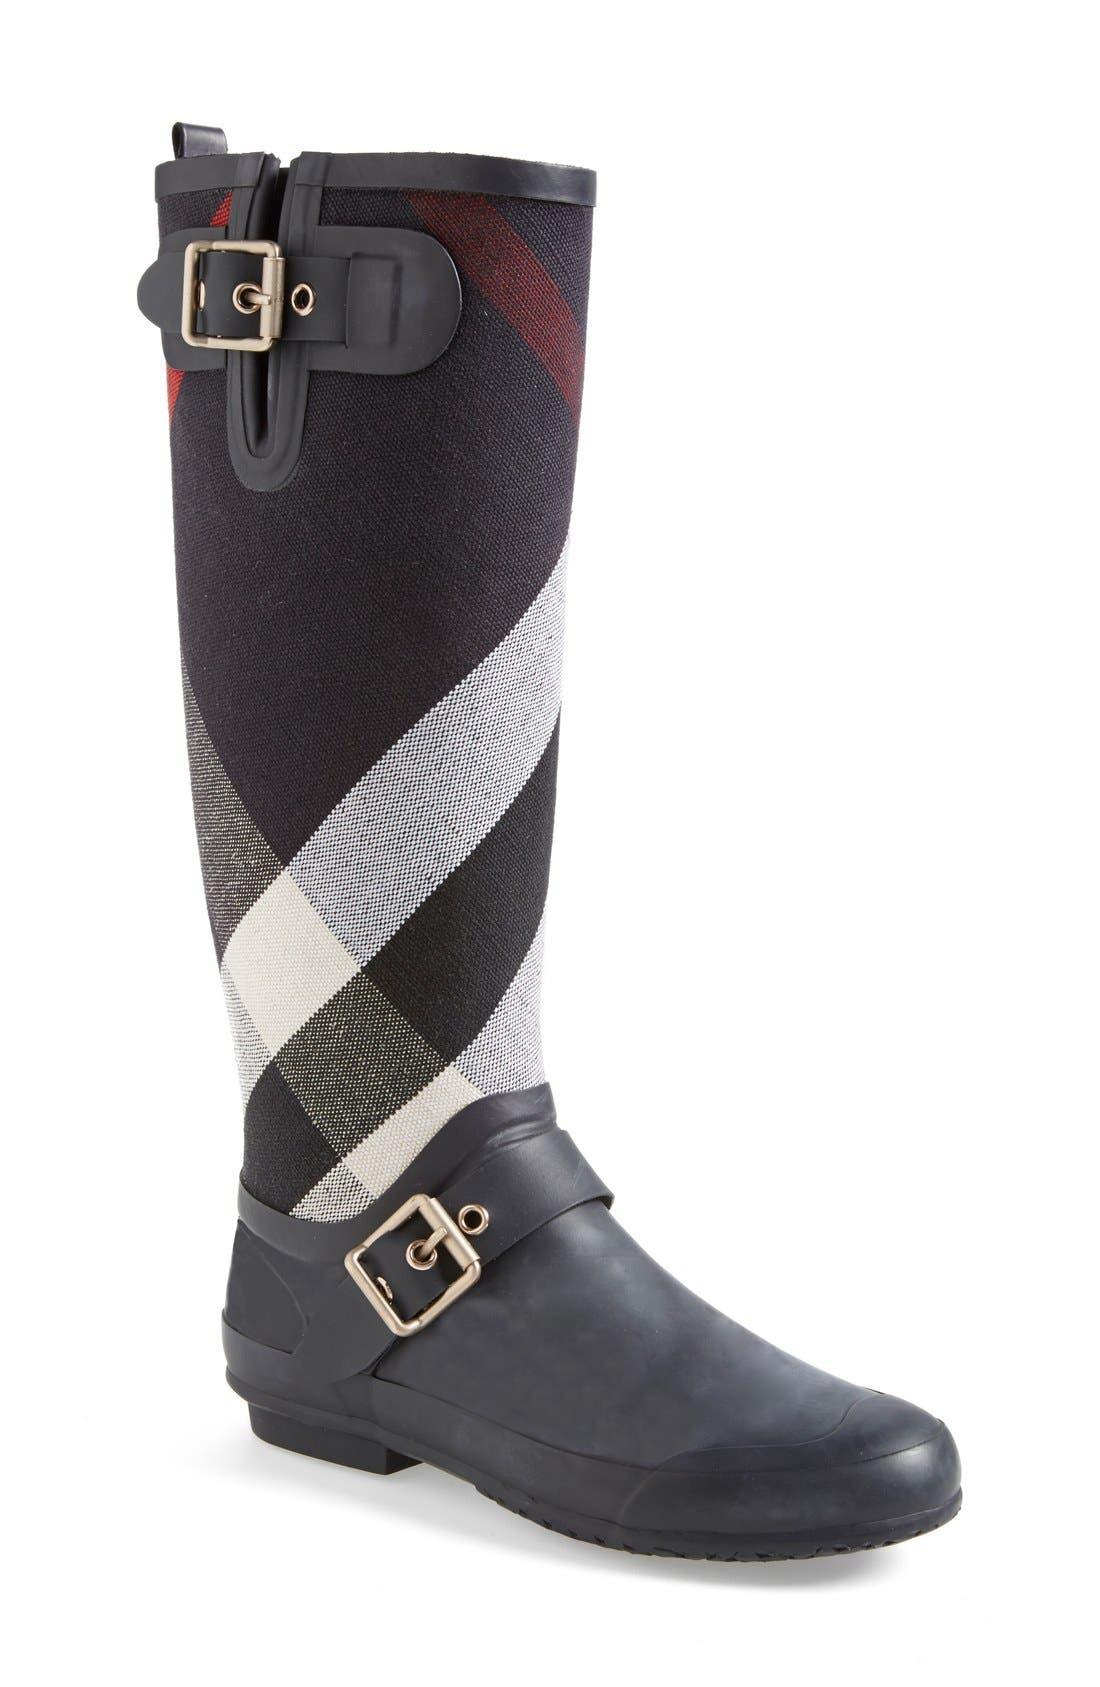 Alternate Image 1 Selected - Burberry 'Birkback' Rain Boot (Women) (Wide Calf)